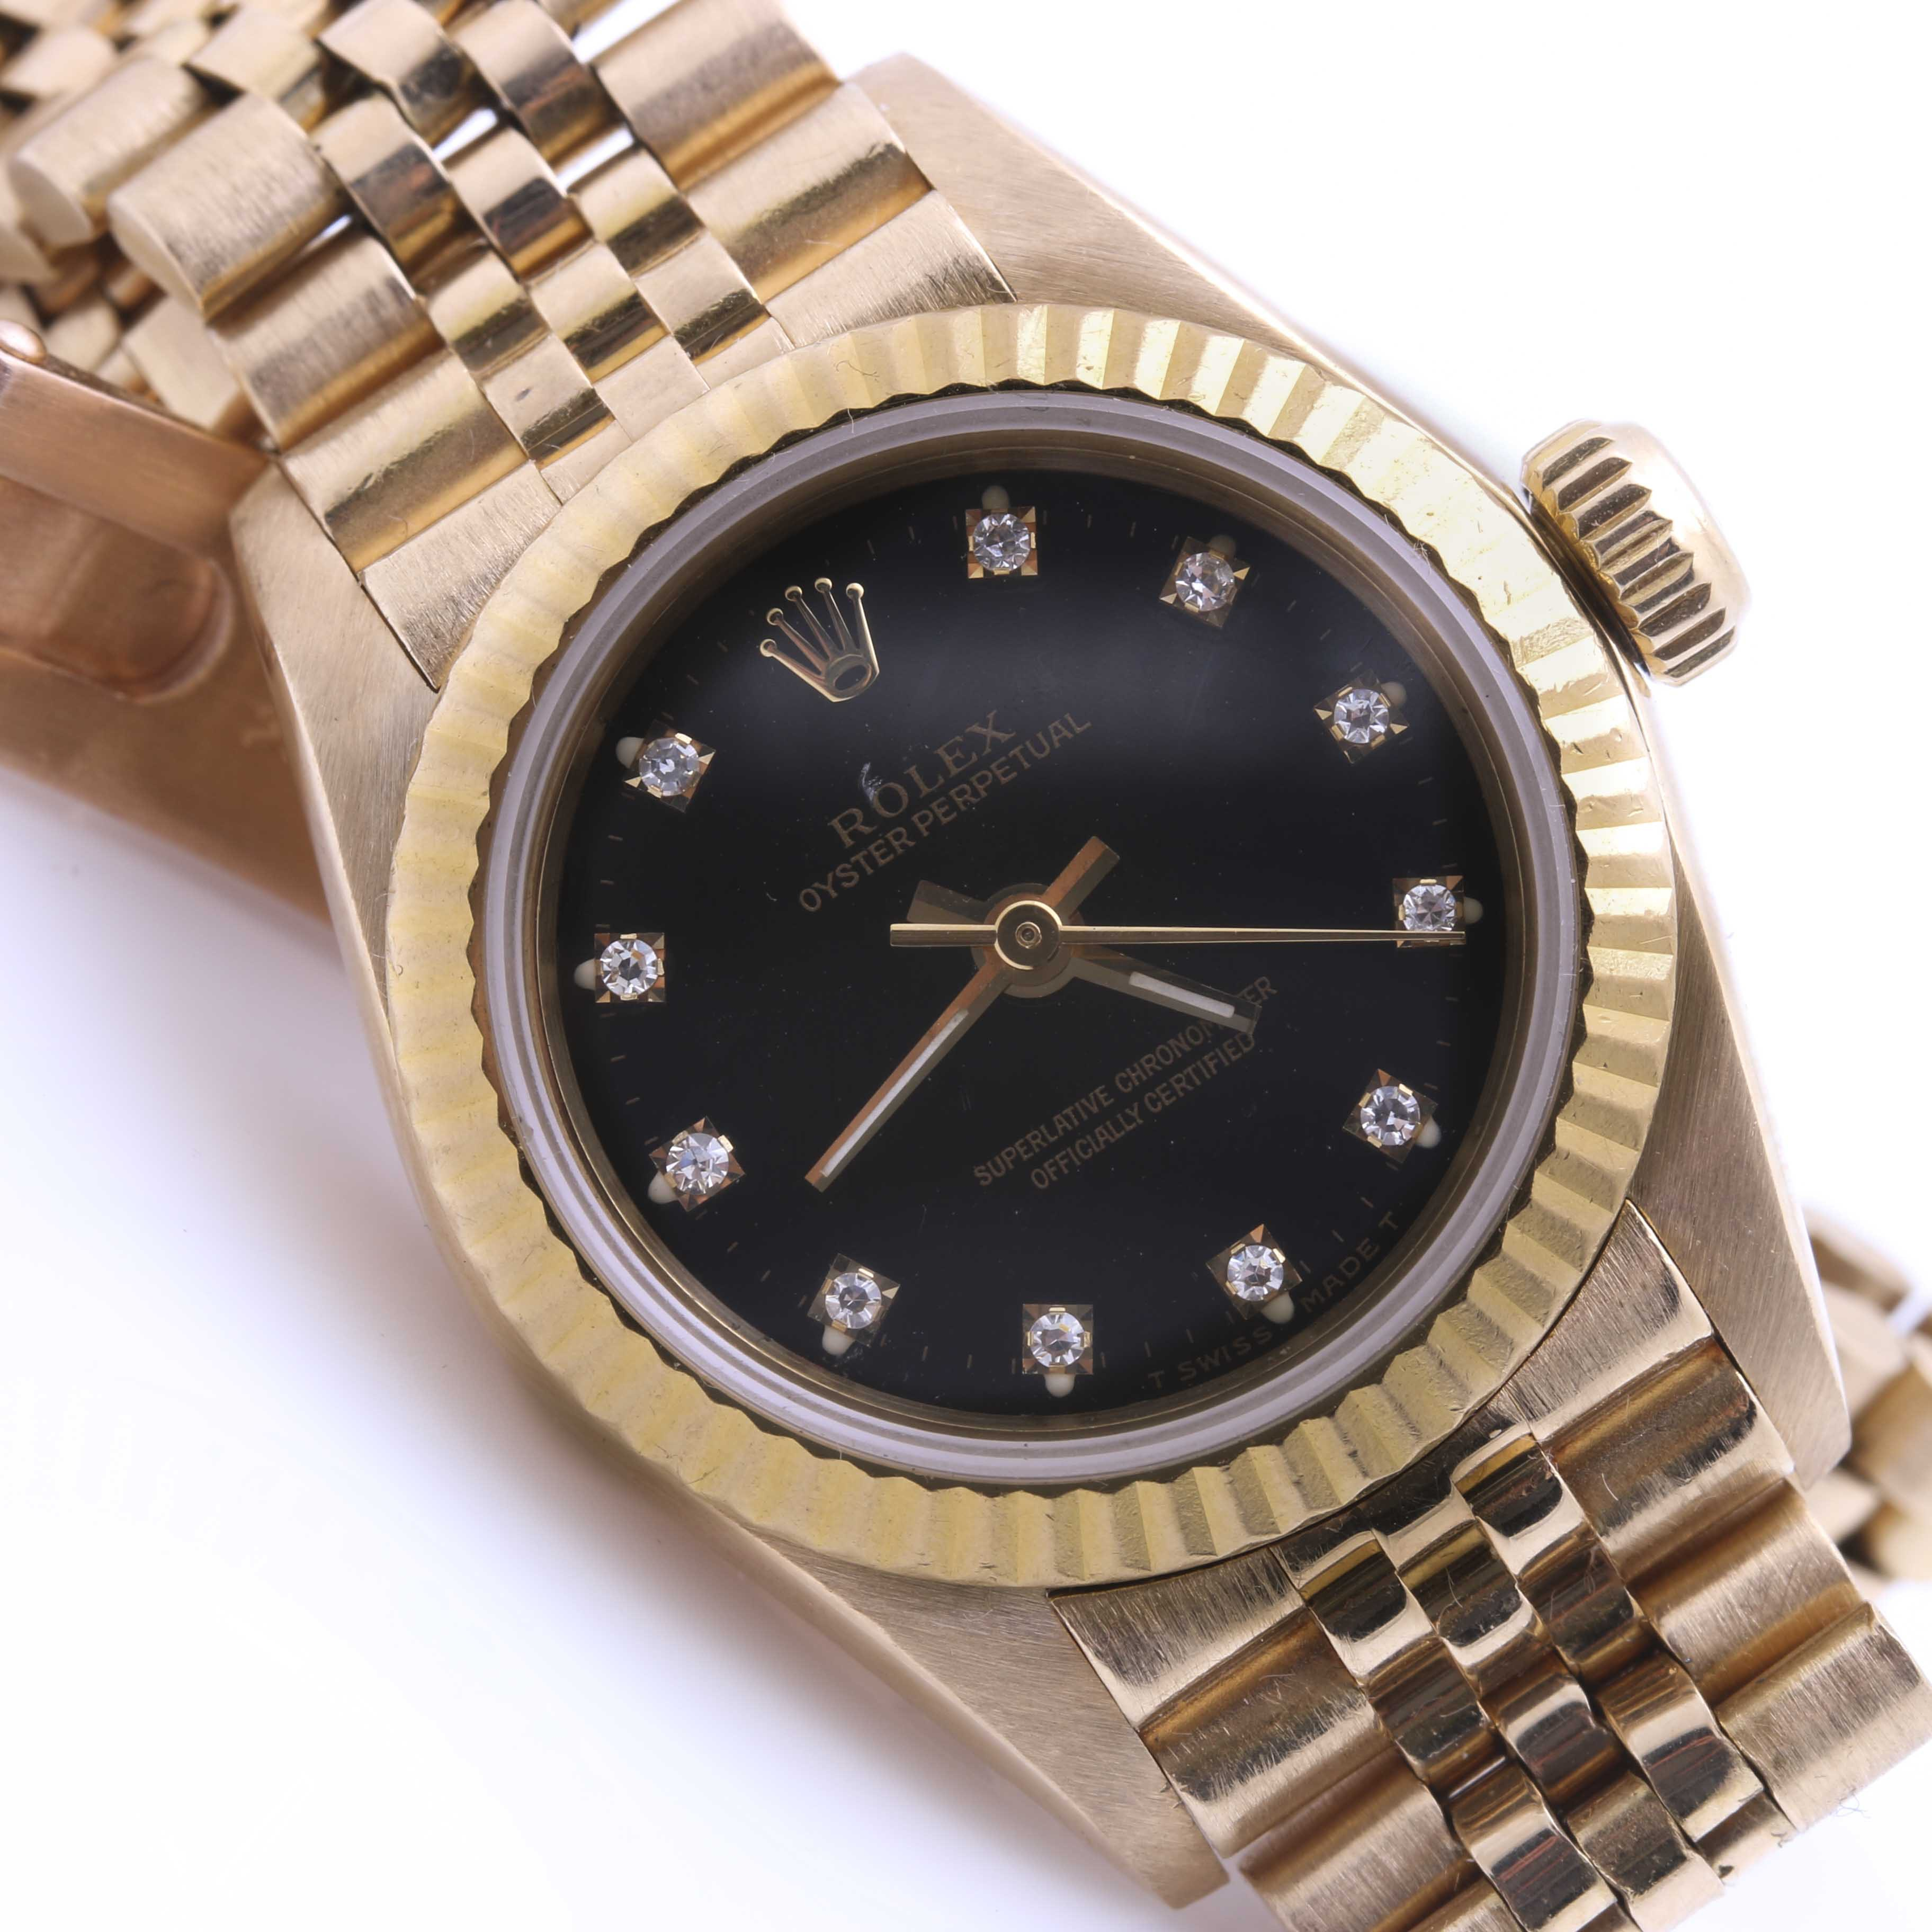 18K Gold Rolex Oyster Perpetual Wristwatch